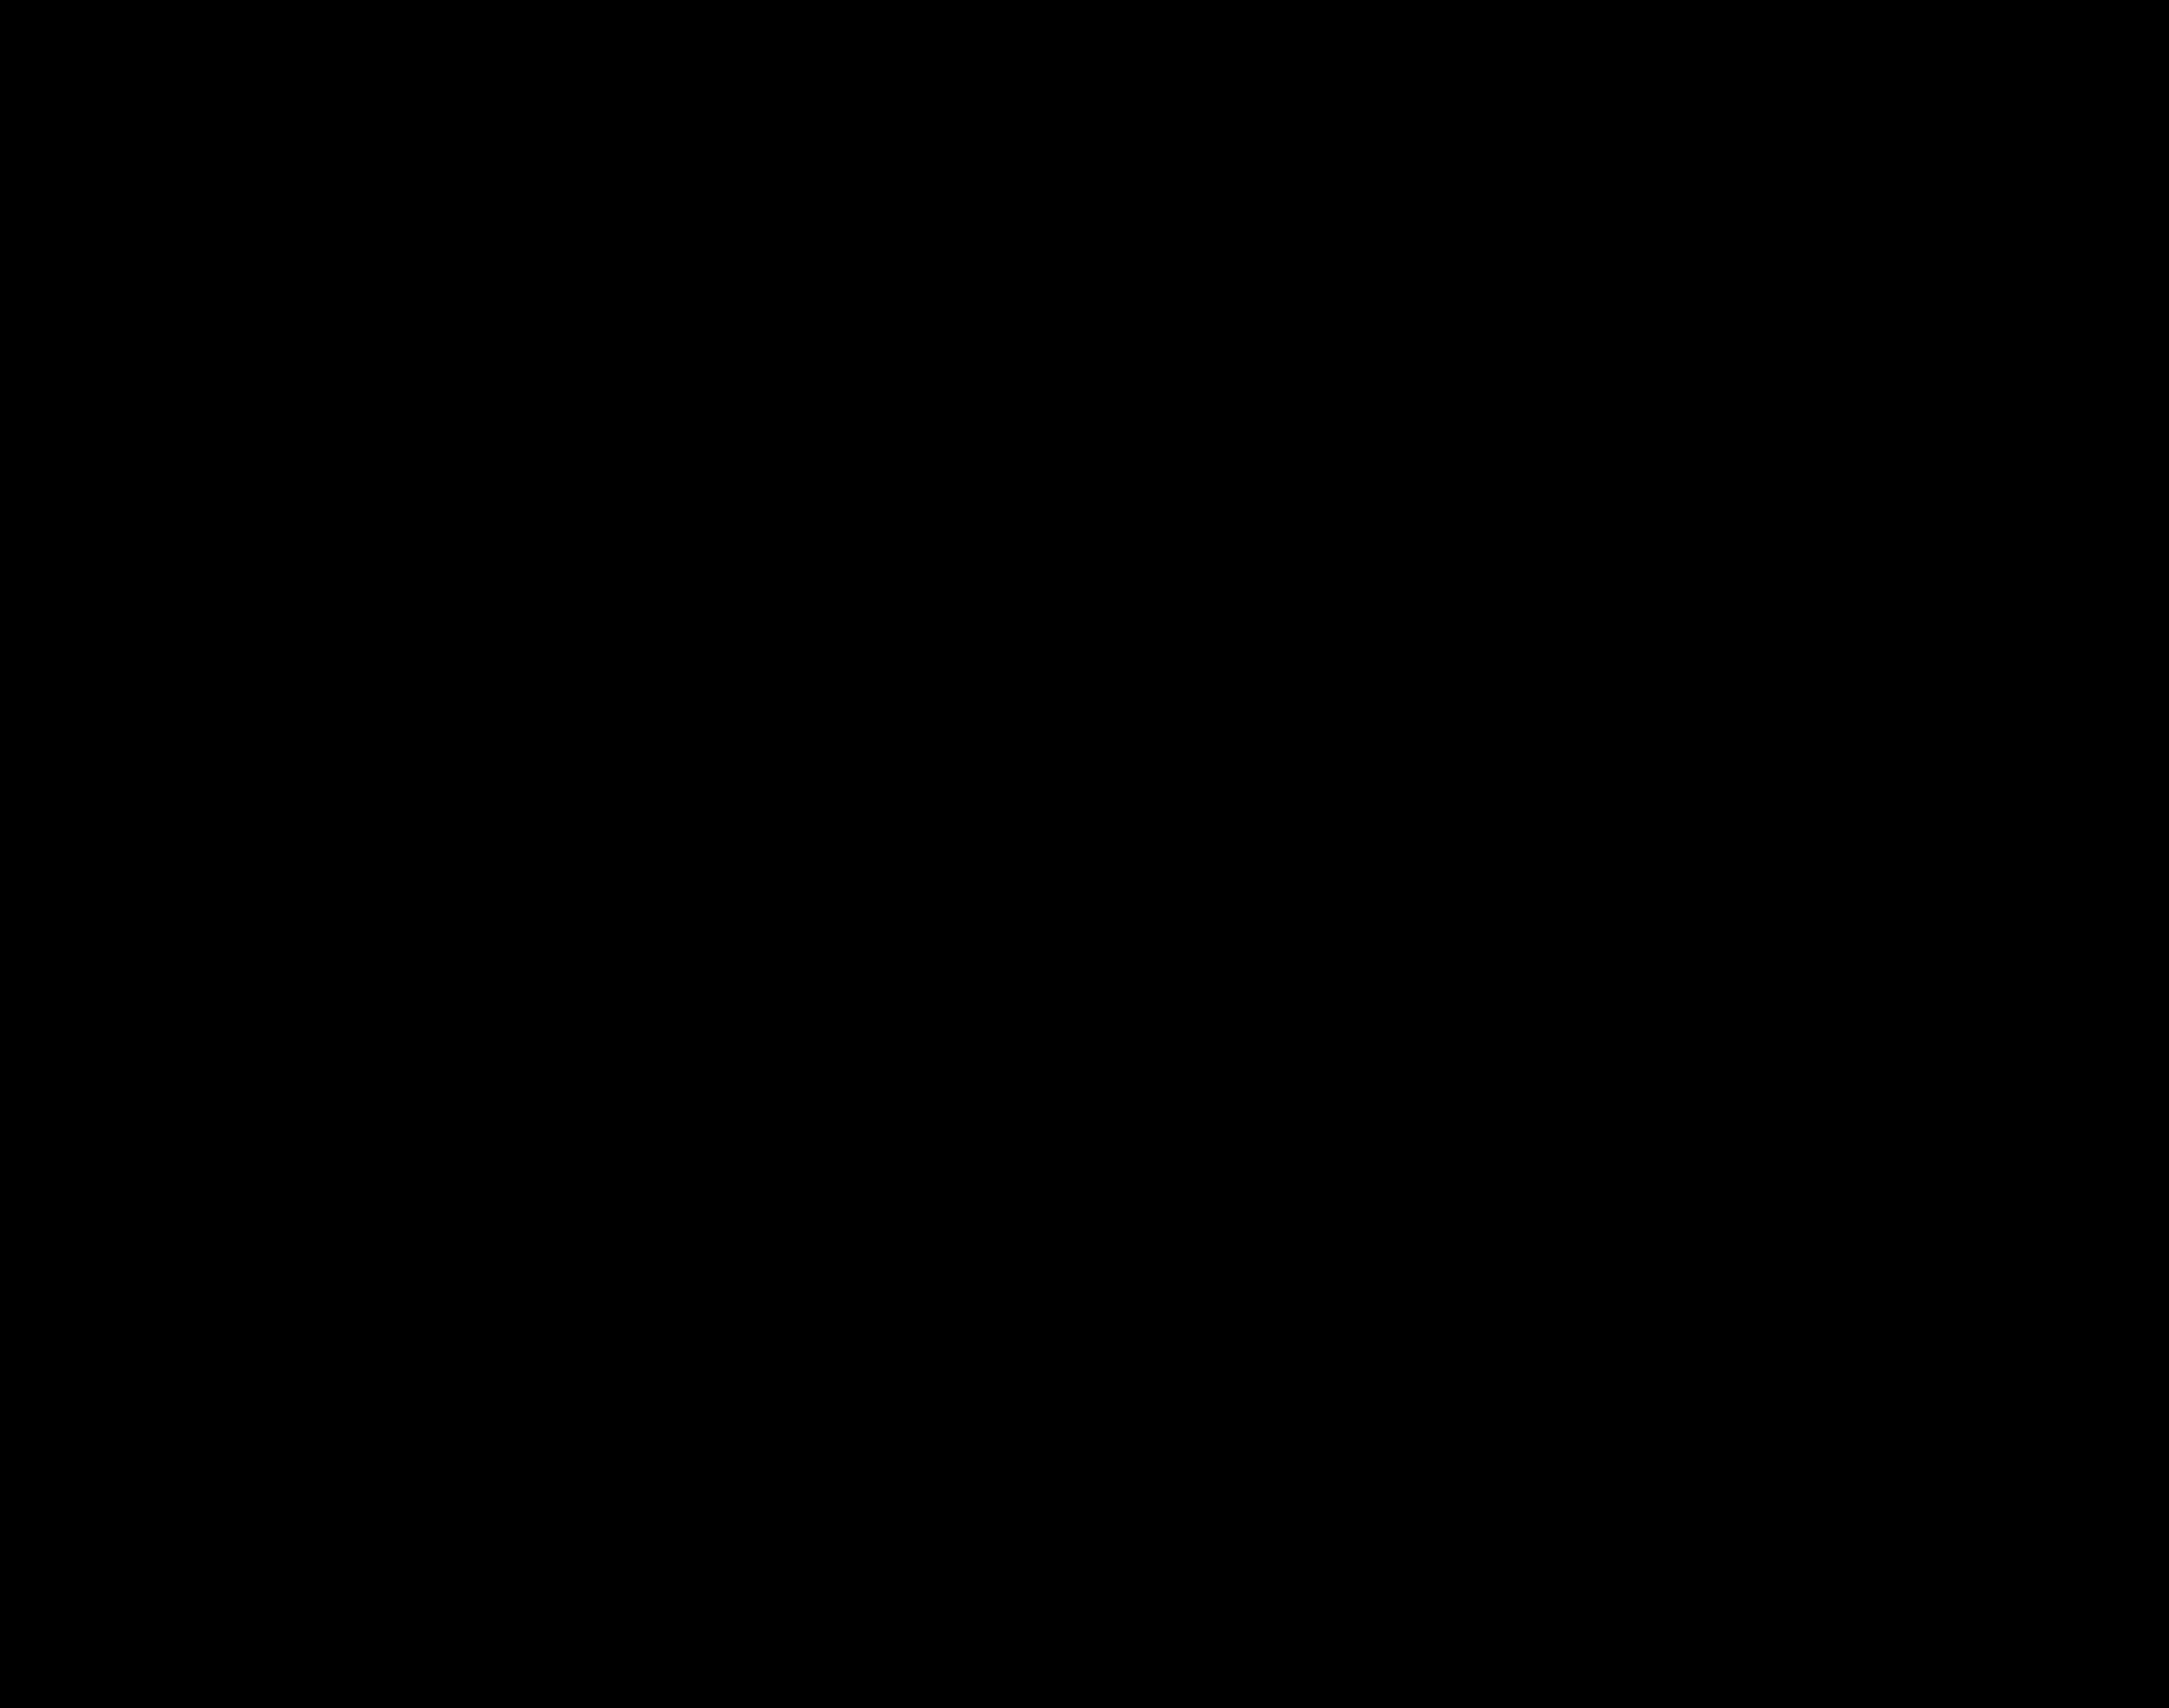 efootball logo 1 - eFootball Logo